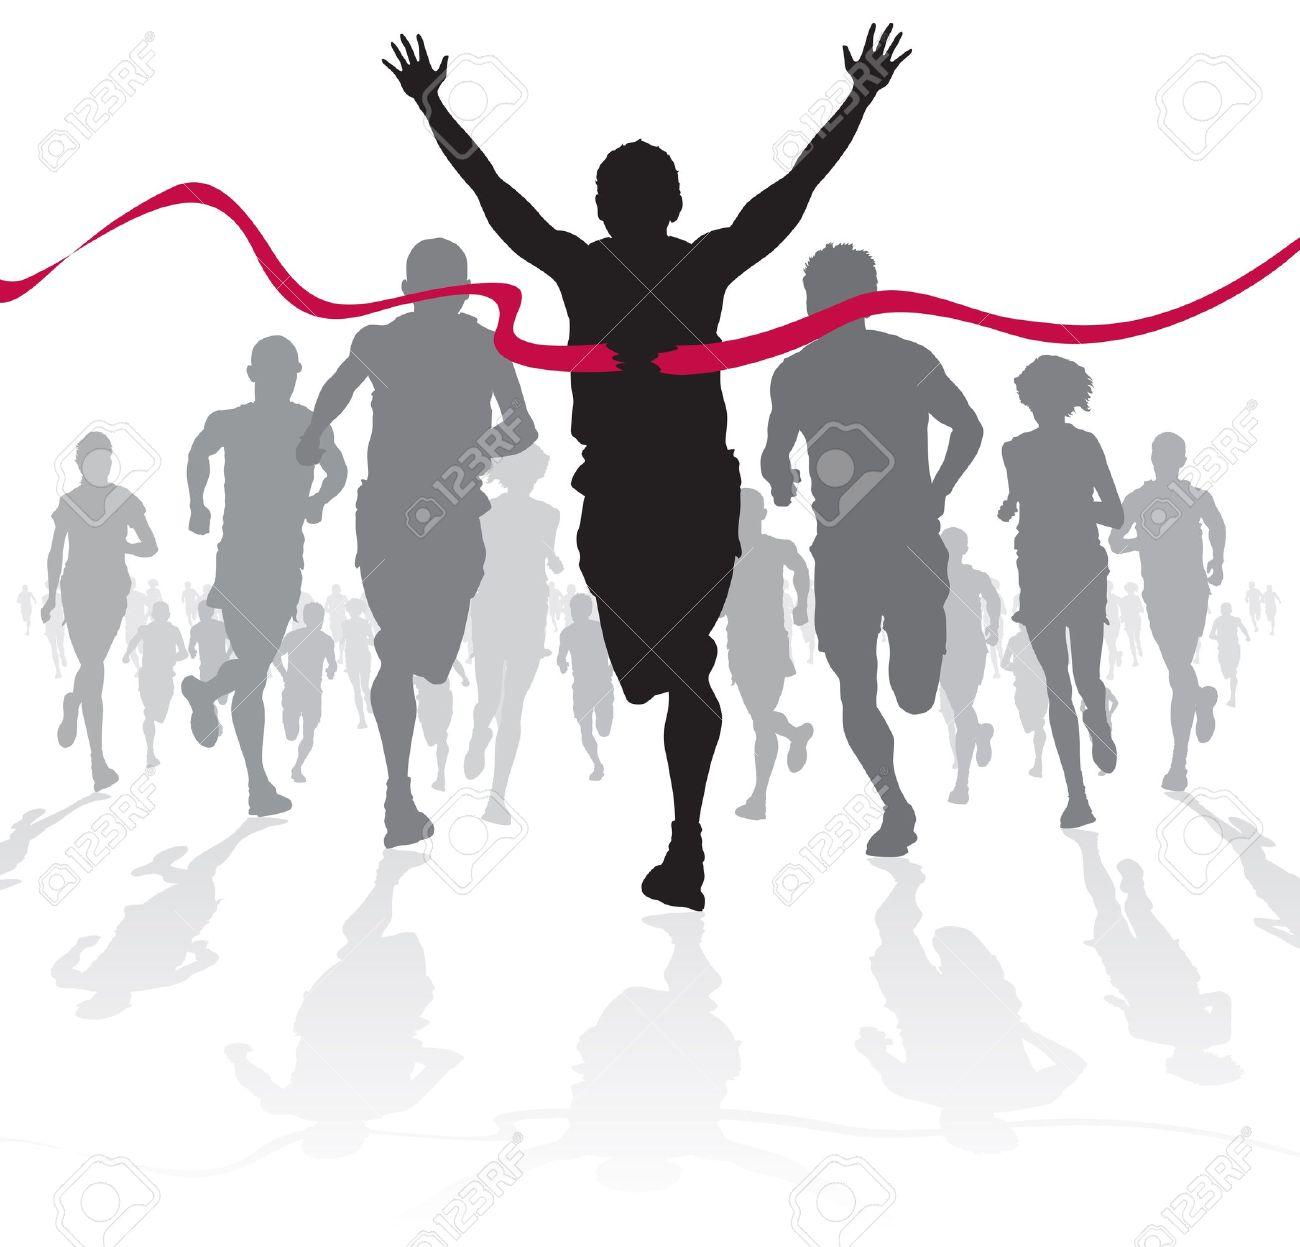 Running Finish Line Clipart The Finish Line Running